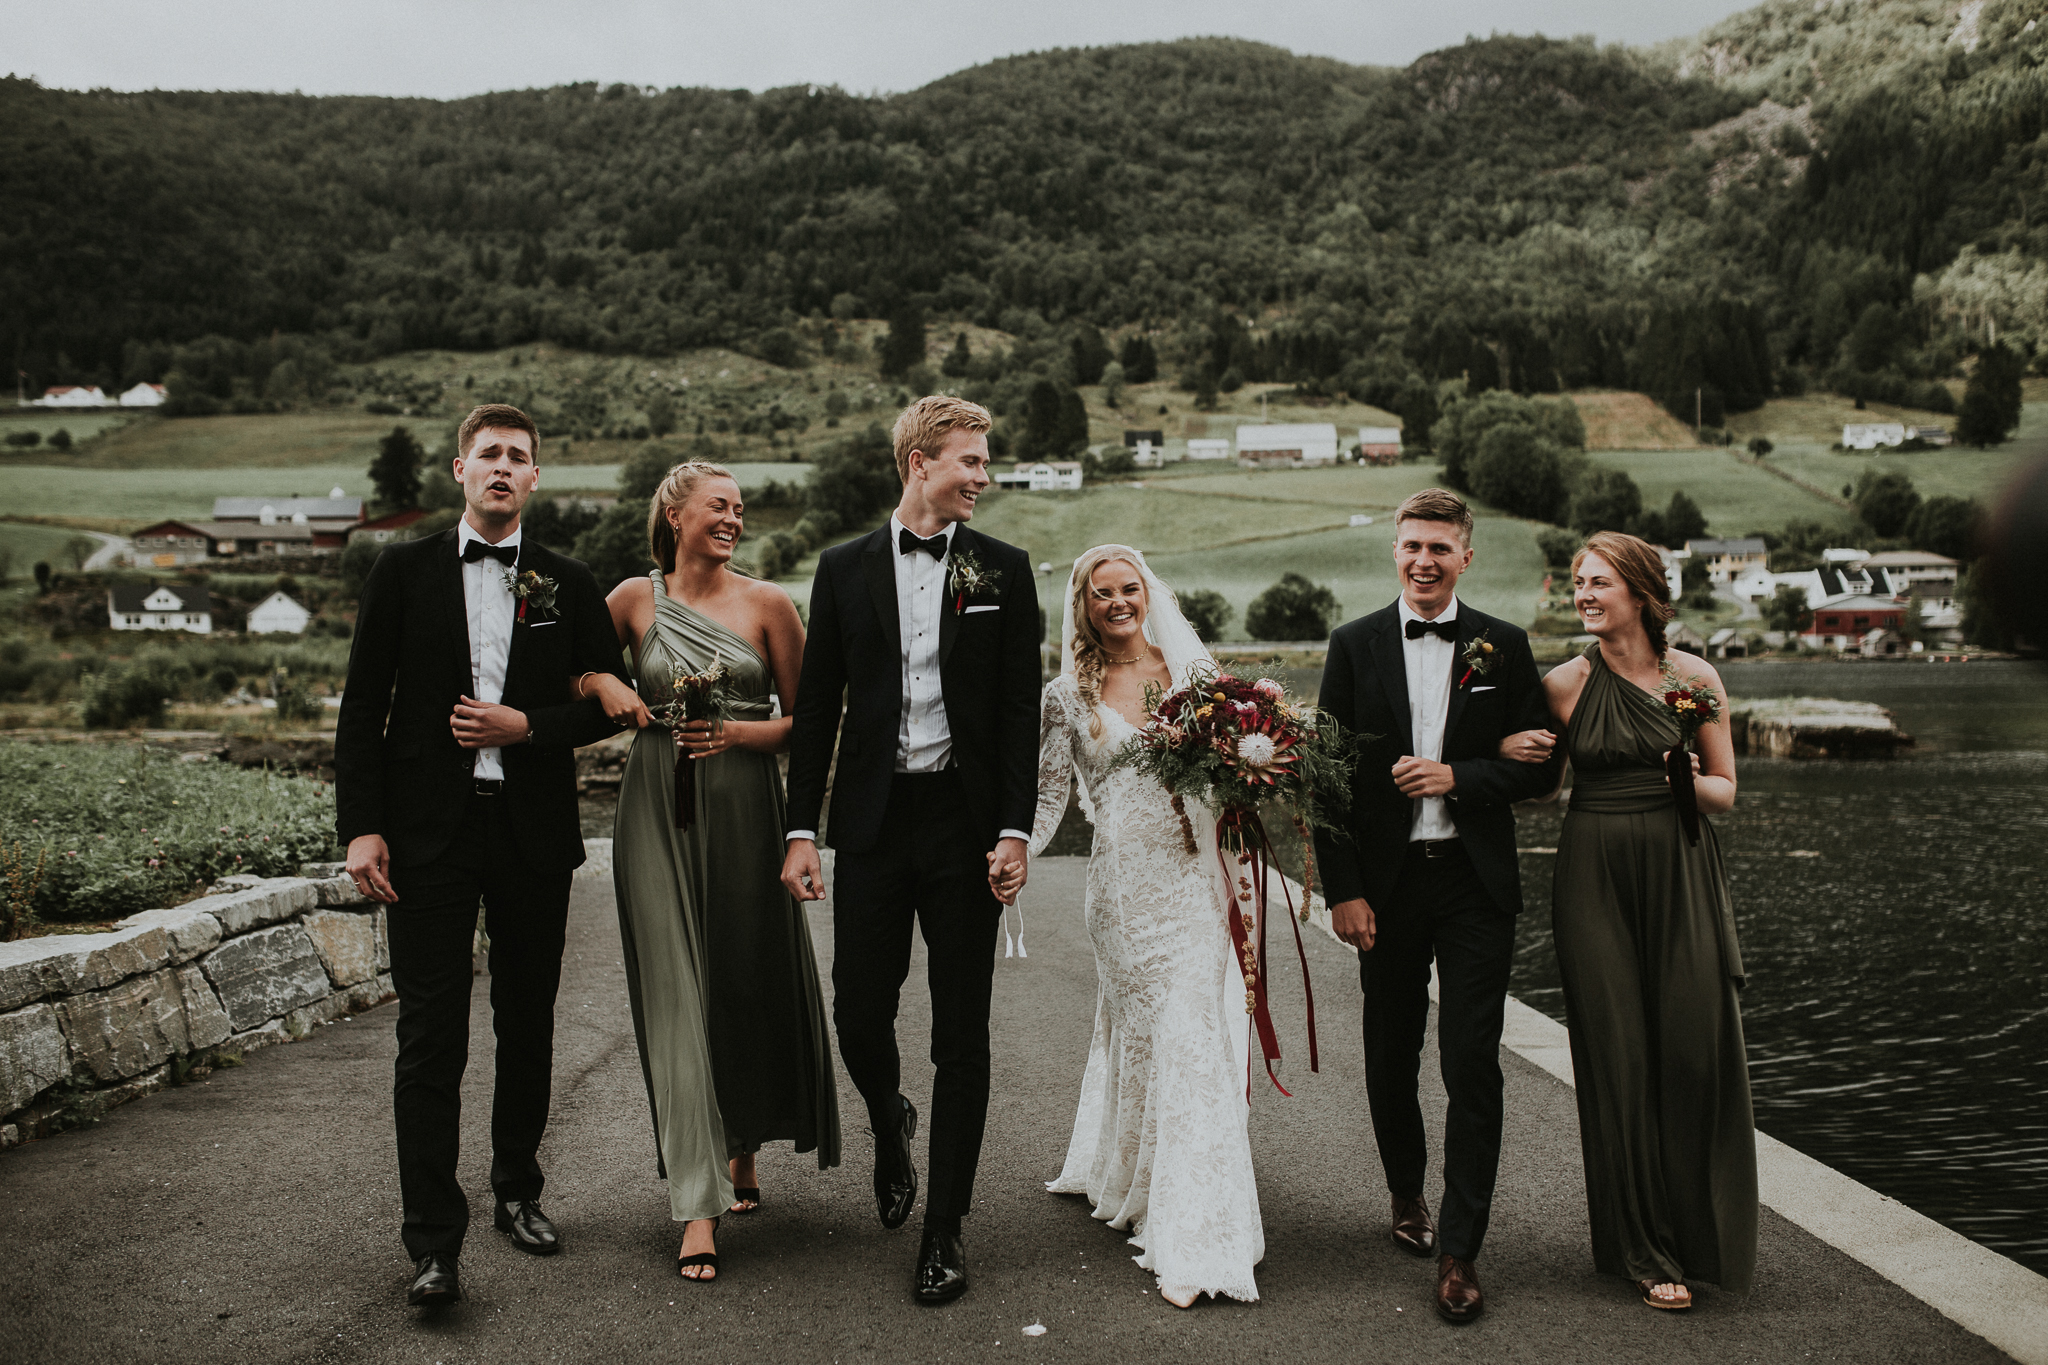 Norway-wedding-photographer-avonne-photography-4.jpg